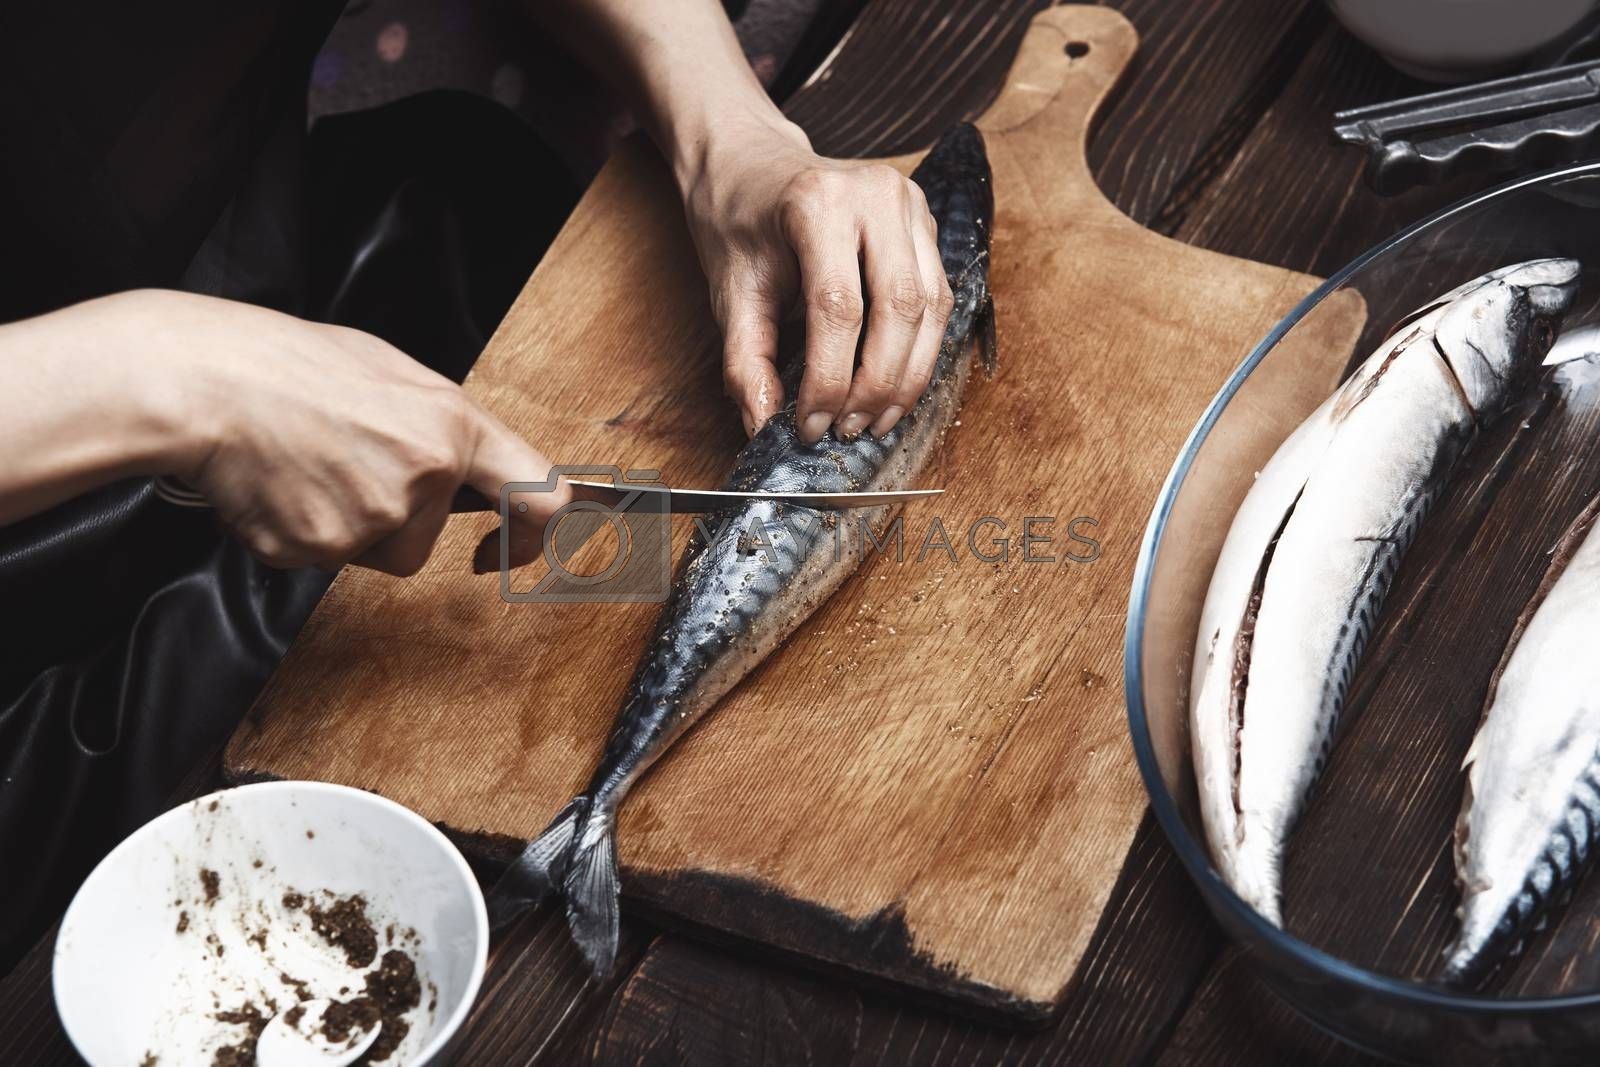 Woman preparing mackerel fish by Novic